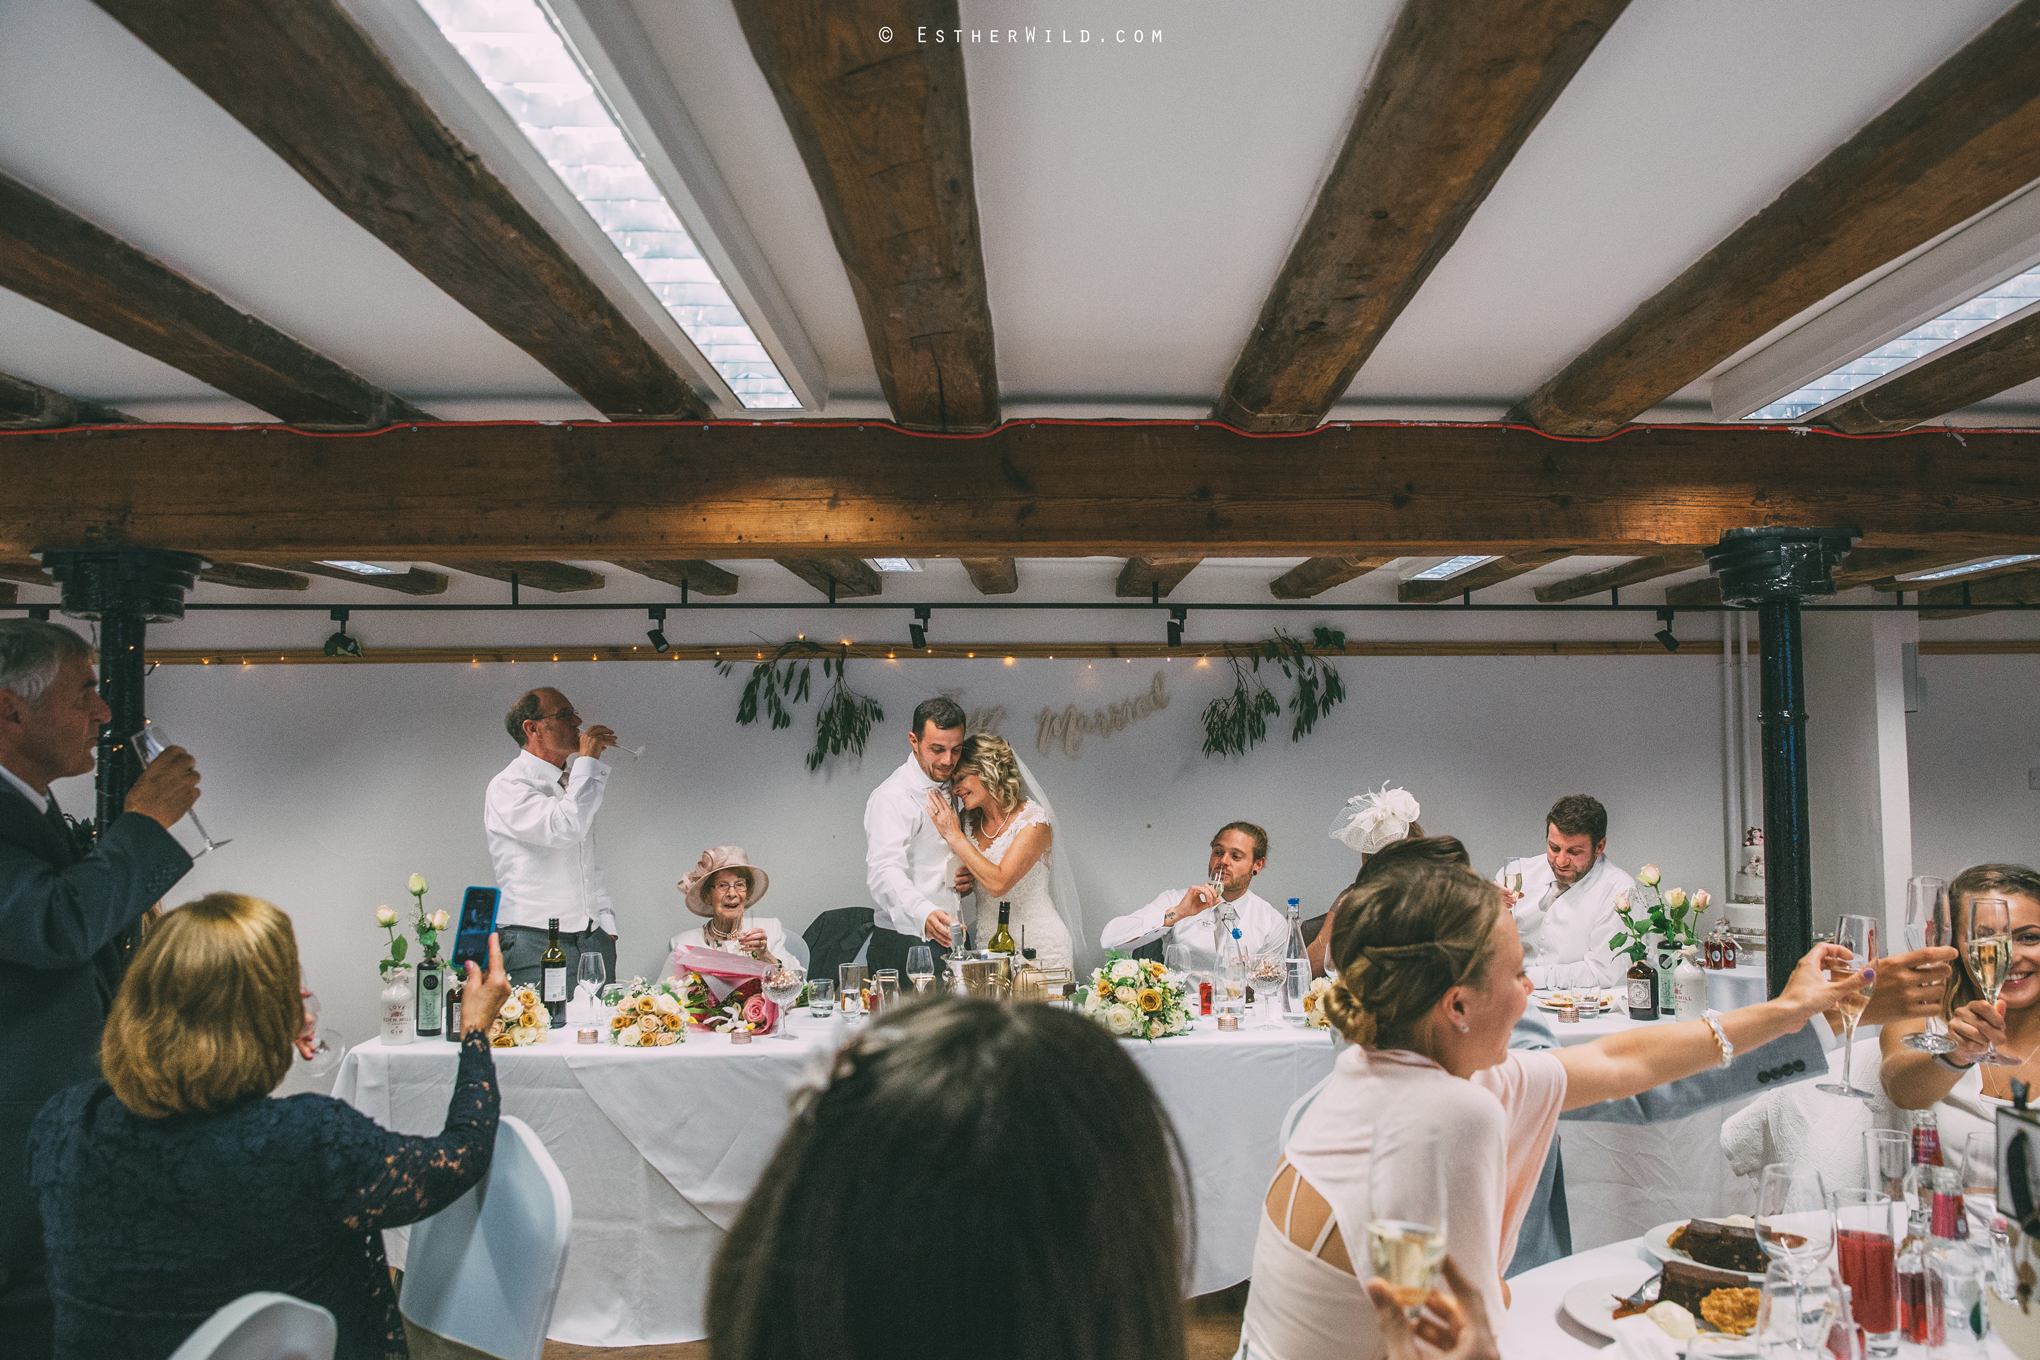 0817_Rathskellar_Kings_Lynn_East_Lexham_Church_Wedding_Photographer_Esther_Wild_IMG_2297.jpg